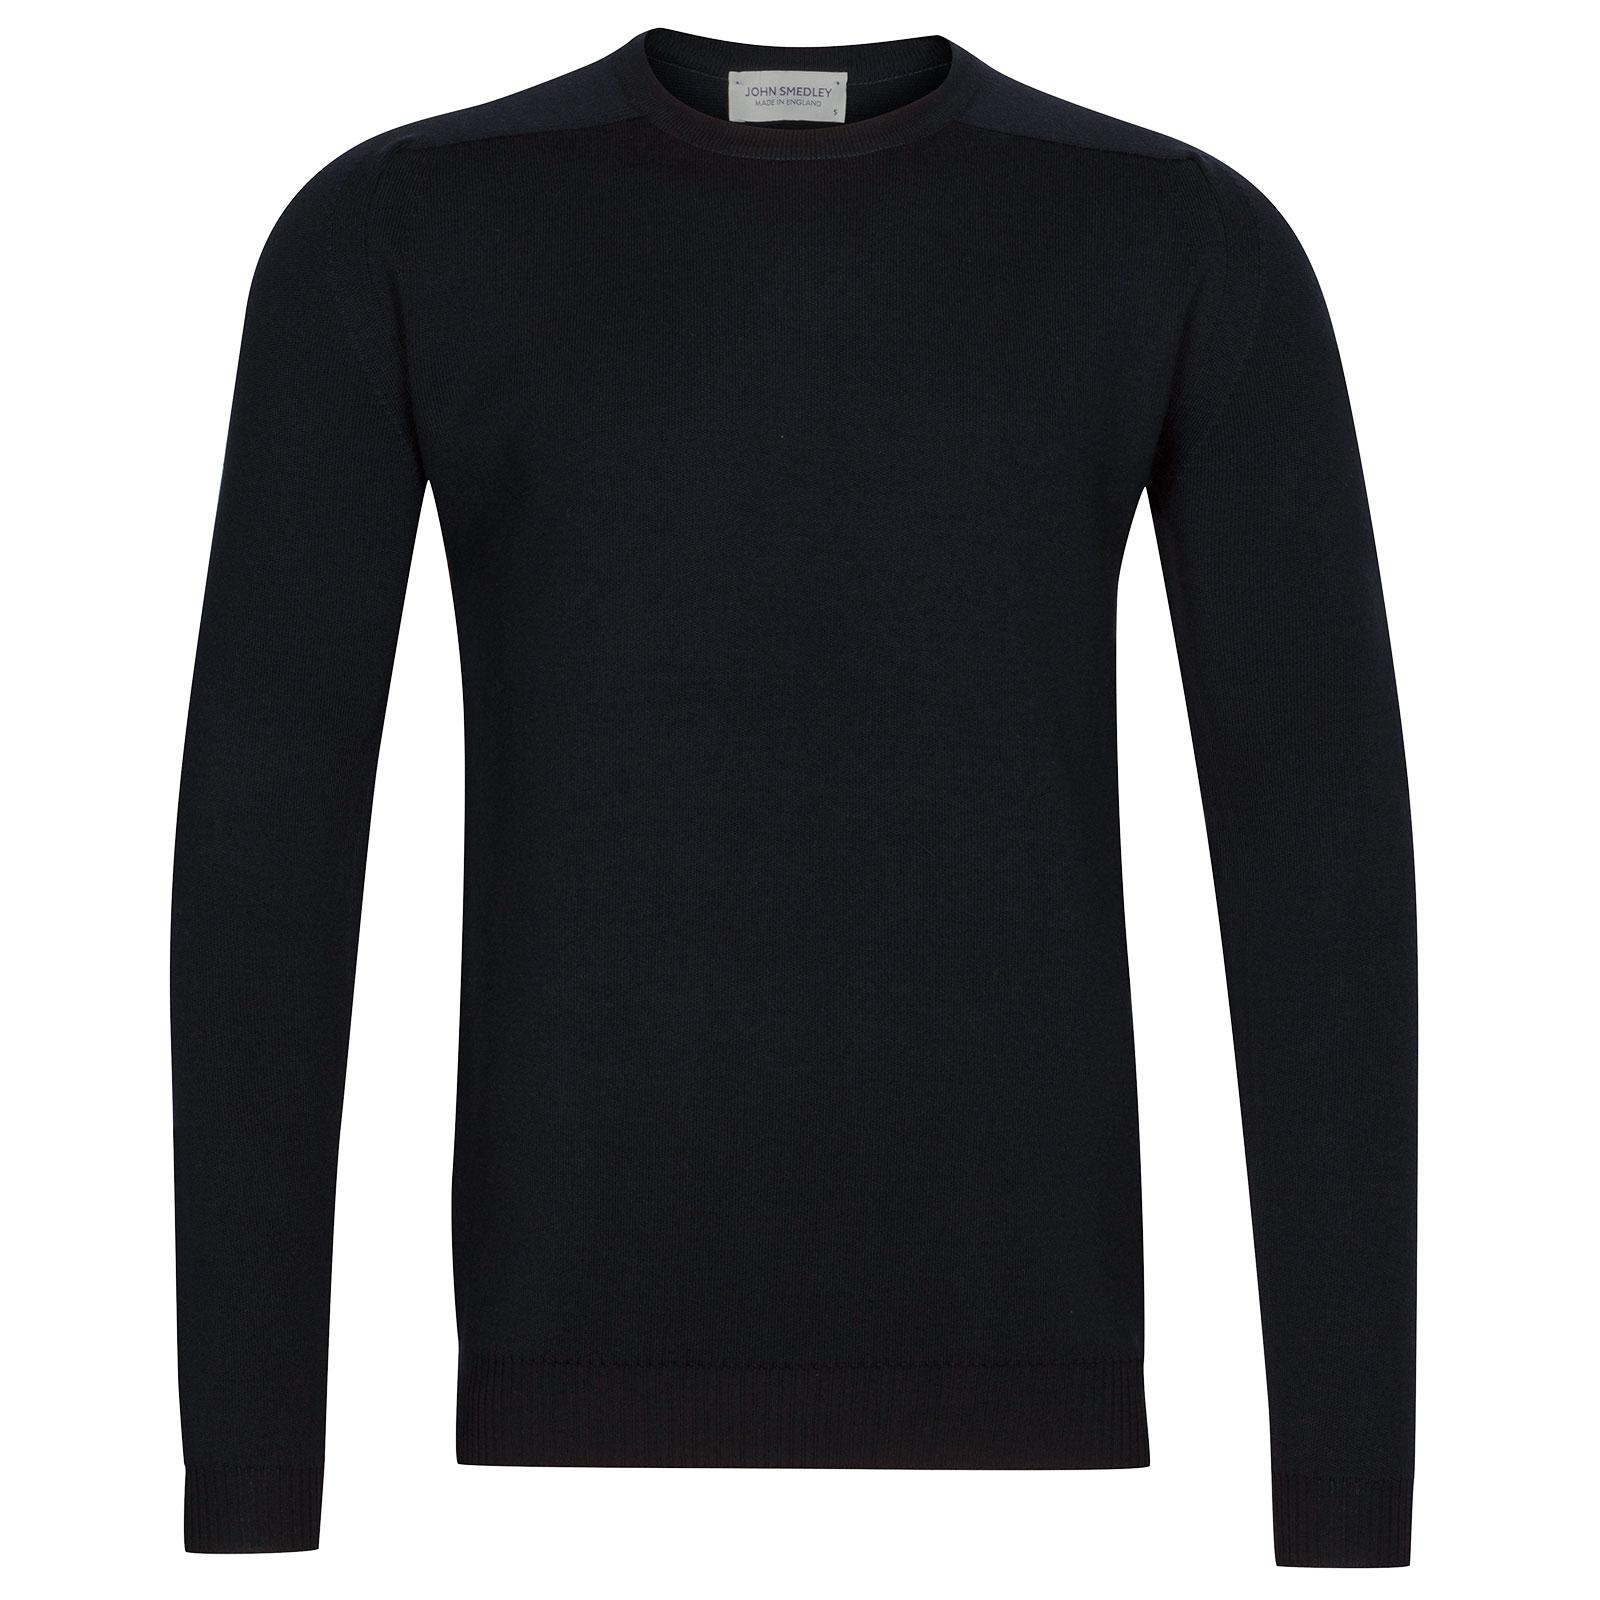 John Smedley Hawling Merino Wool Pullover in Midnight-M